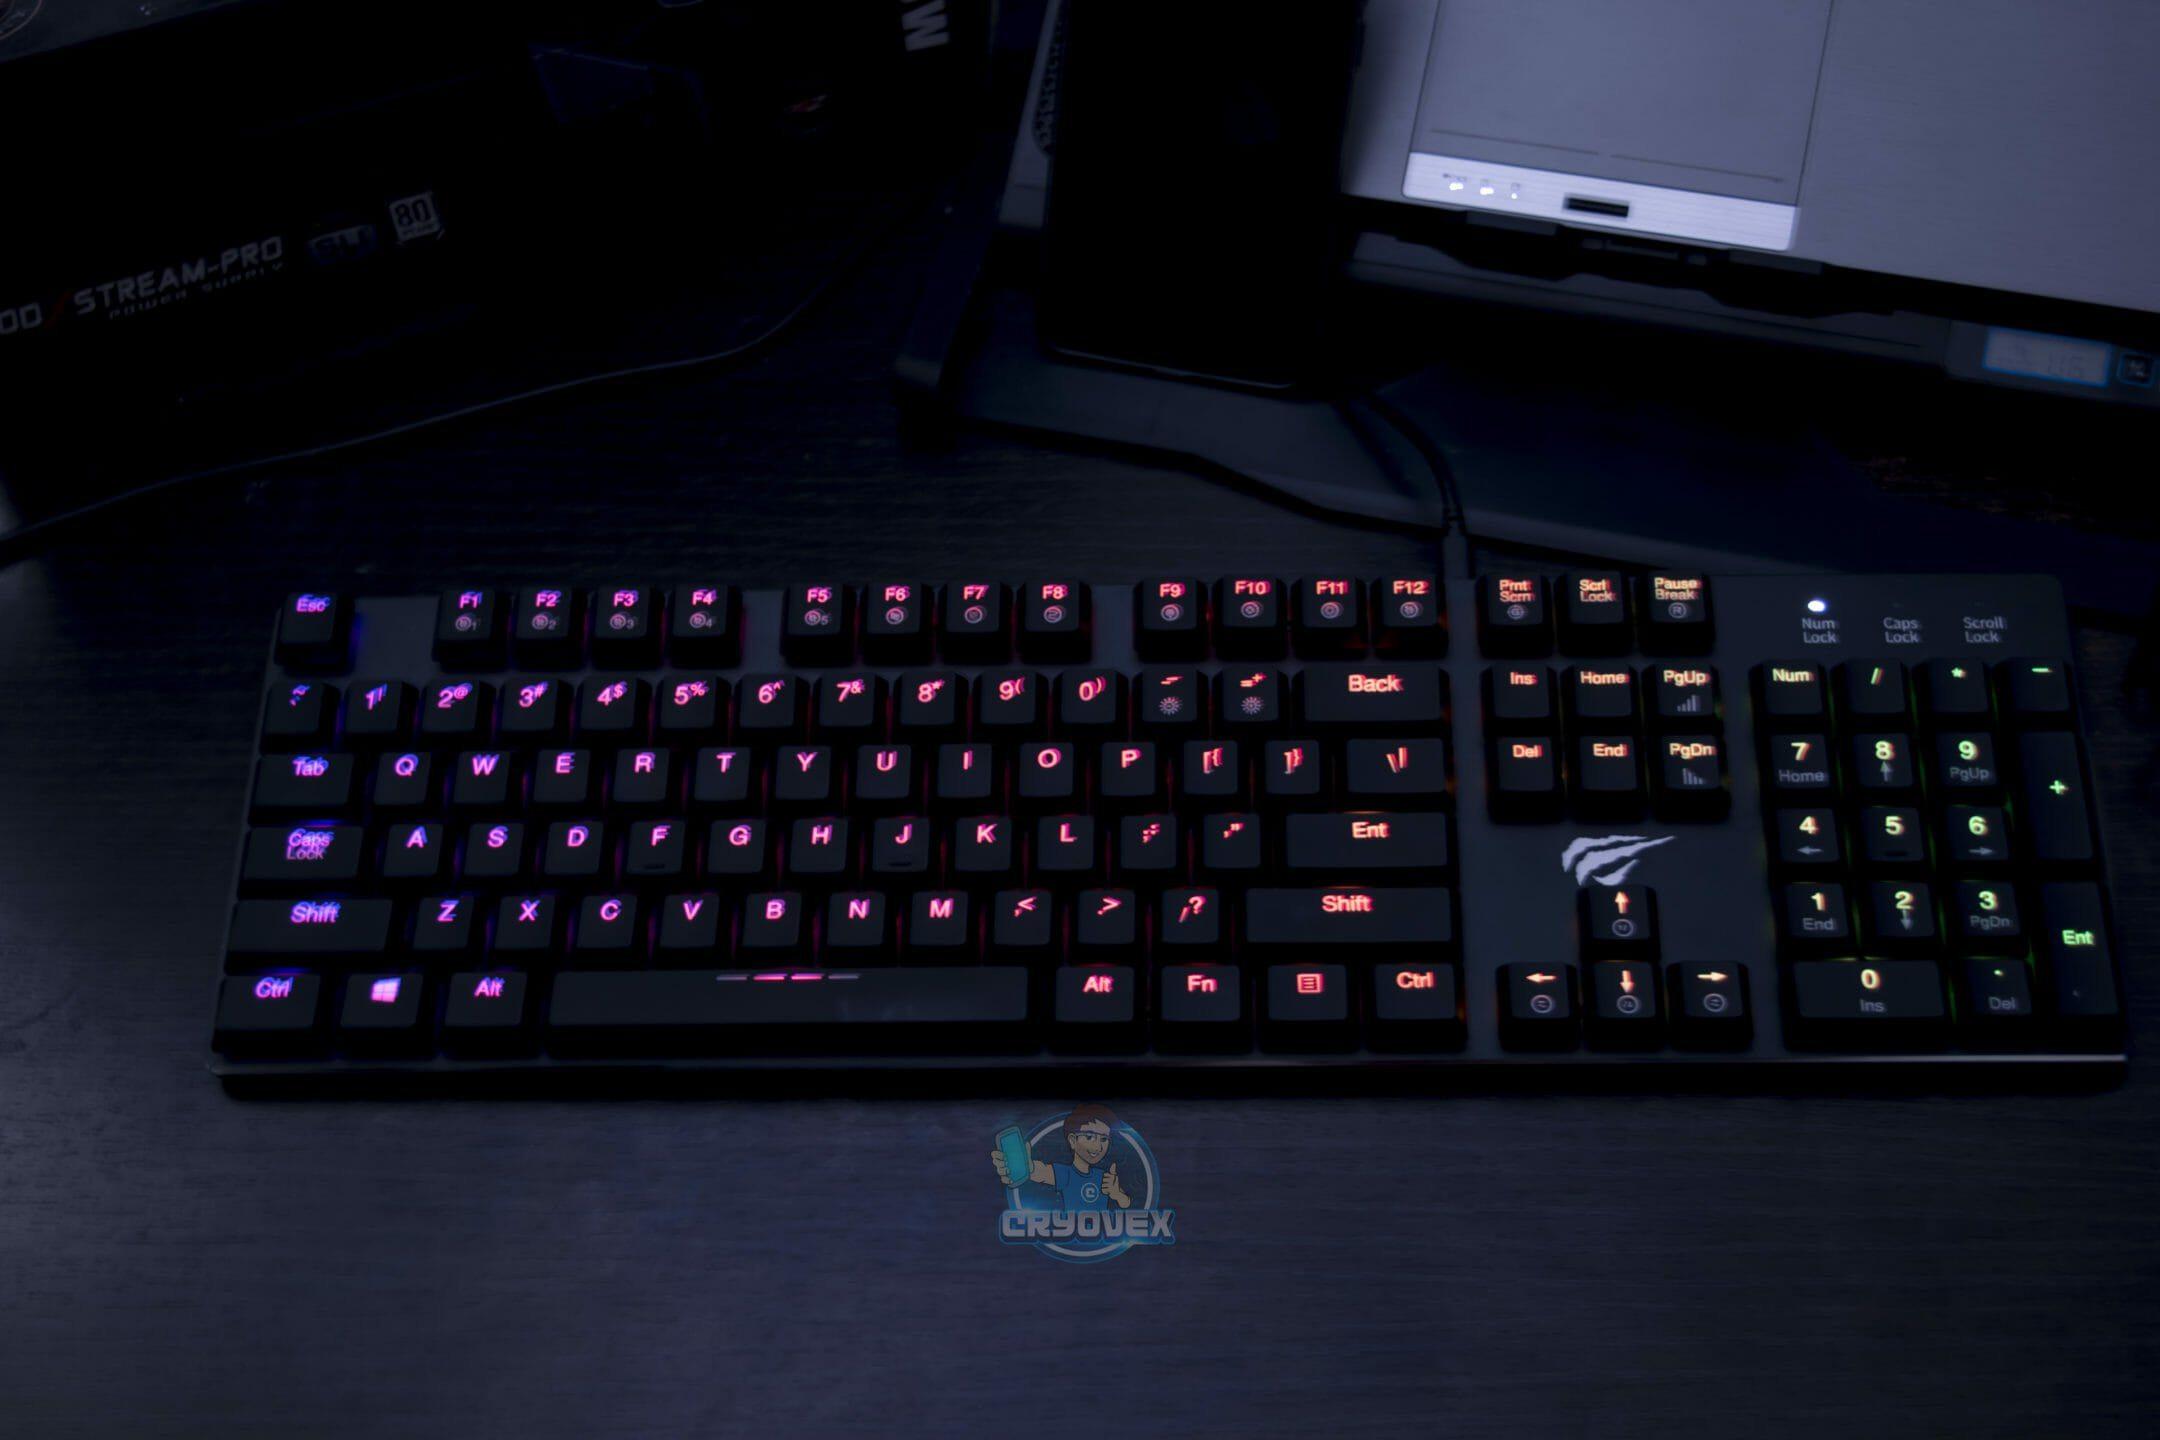 Mechanical Gaming Keyboard under $100 with RGB lighting?